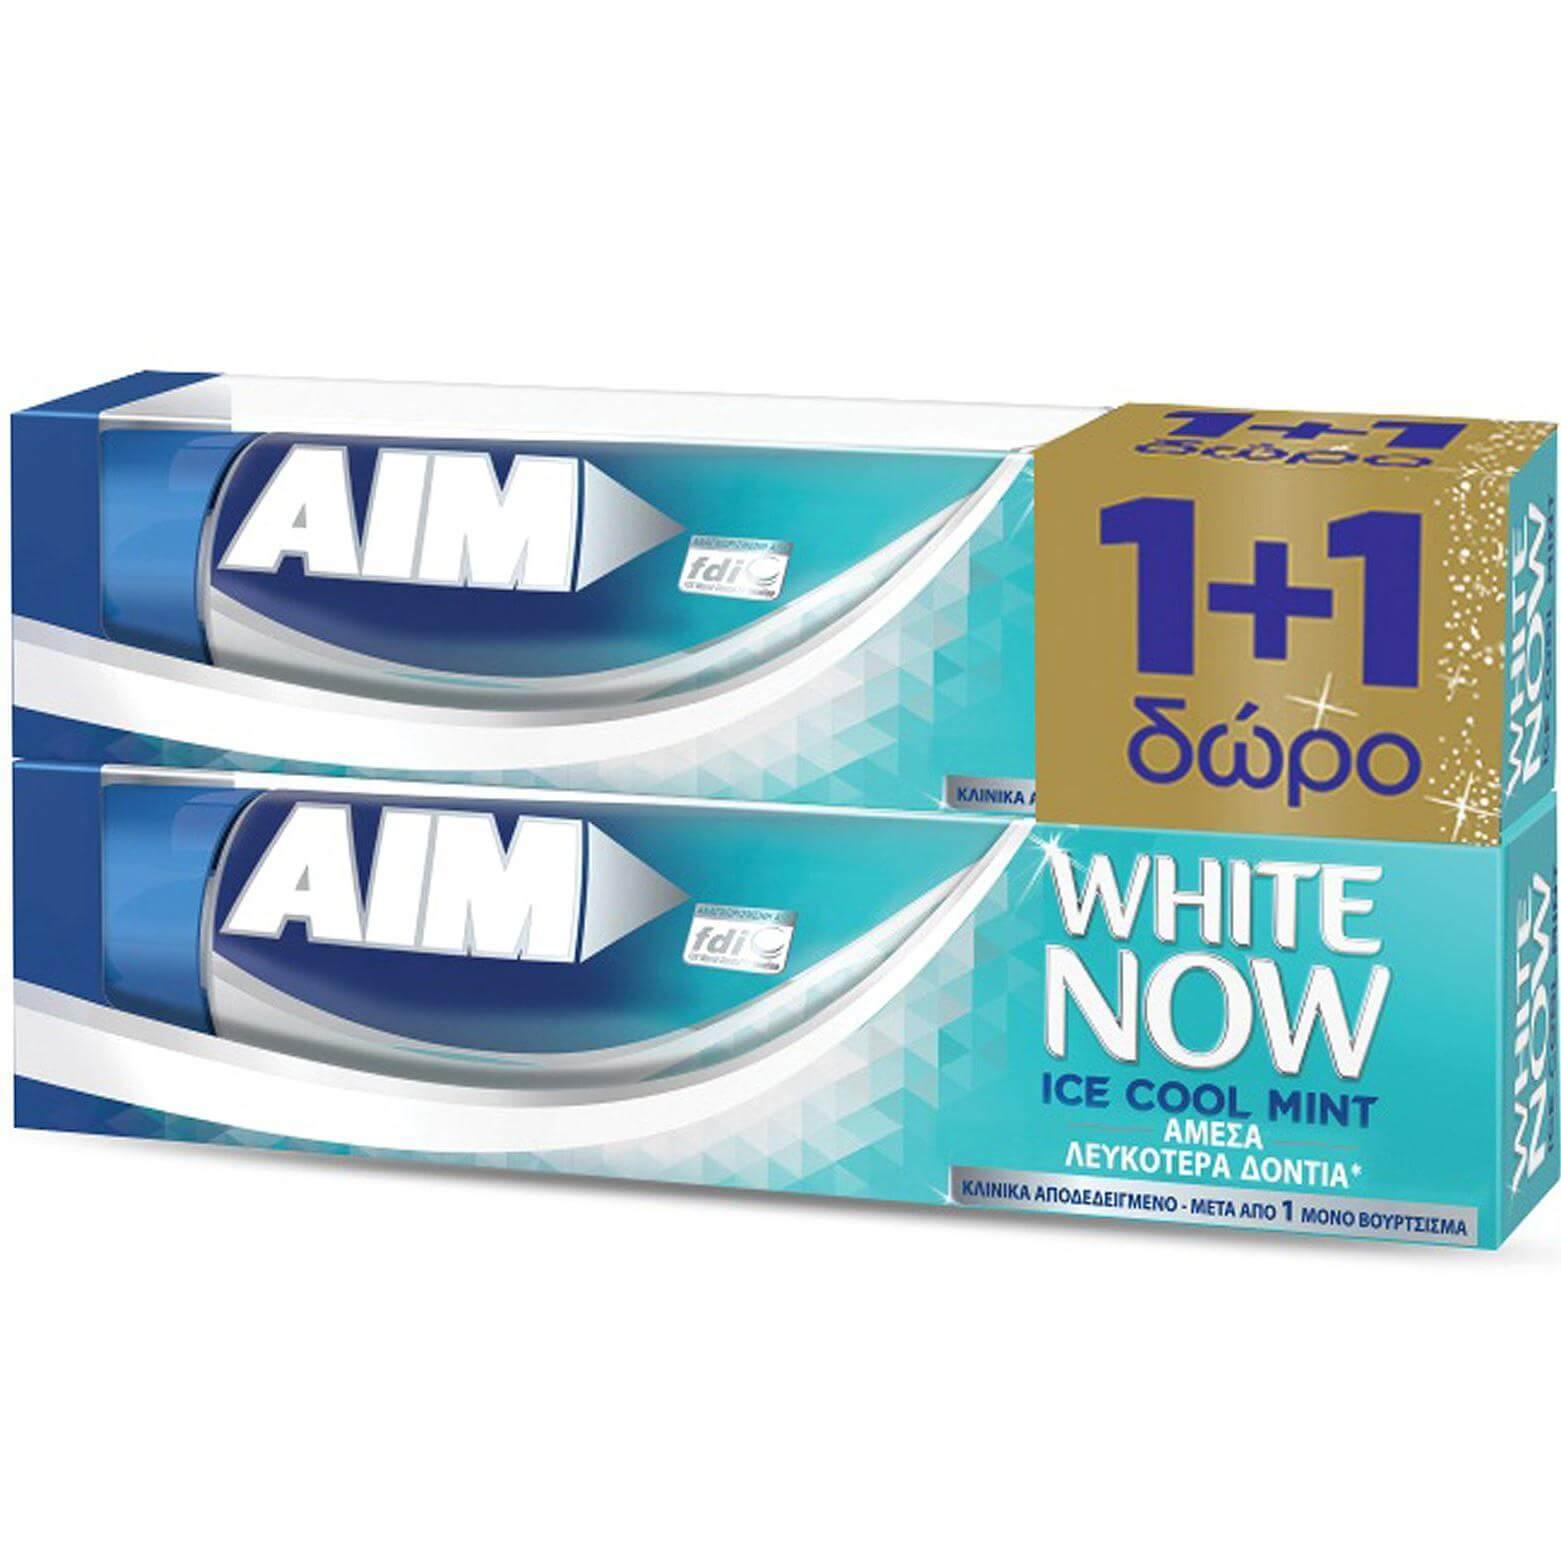 Aim Πακέτο Προσφοράς White Now Ice Cool Mint Οδοντόκρεμα για Άμεσα Λευκότερα Δόντια, με Δροσερή Γεύση Μέντα 1+1 Δώρο 2 x 75ml